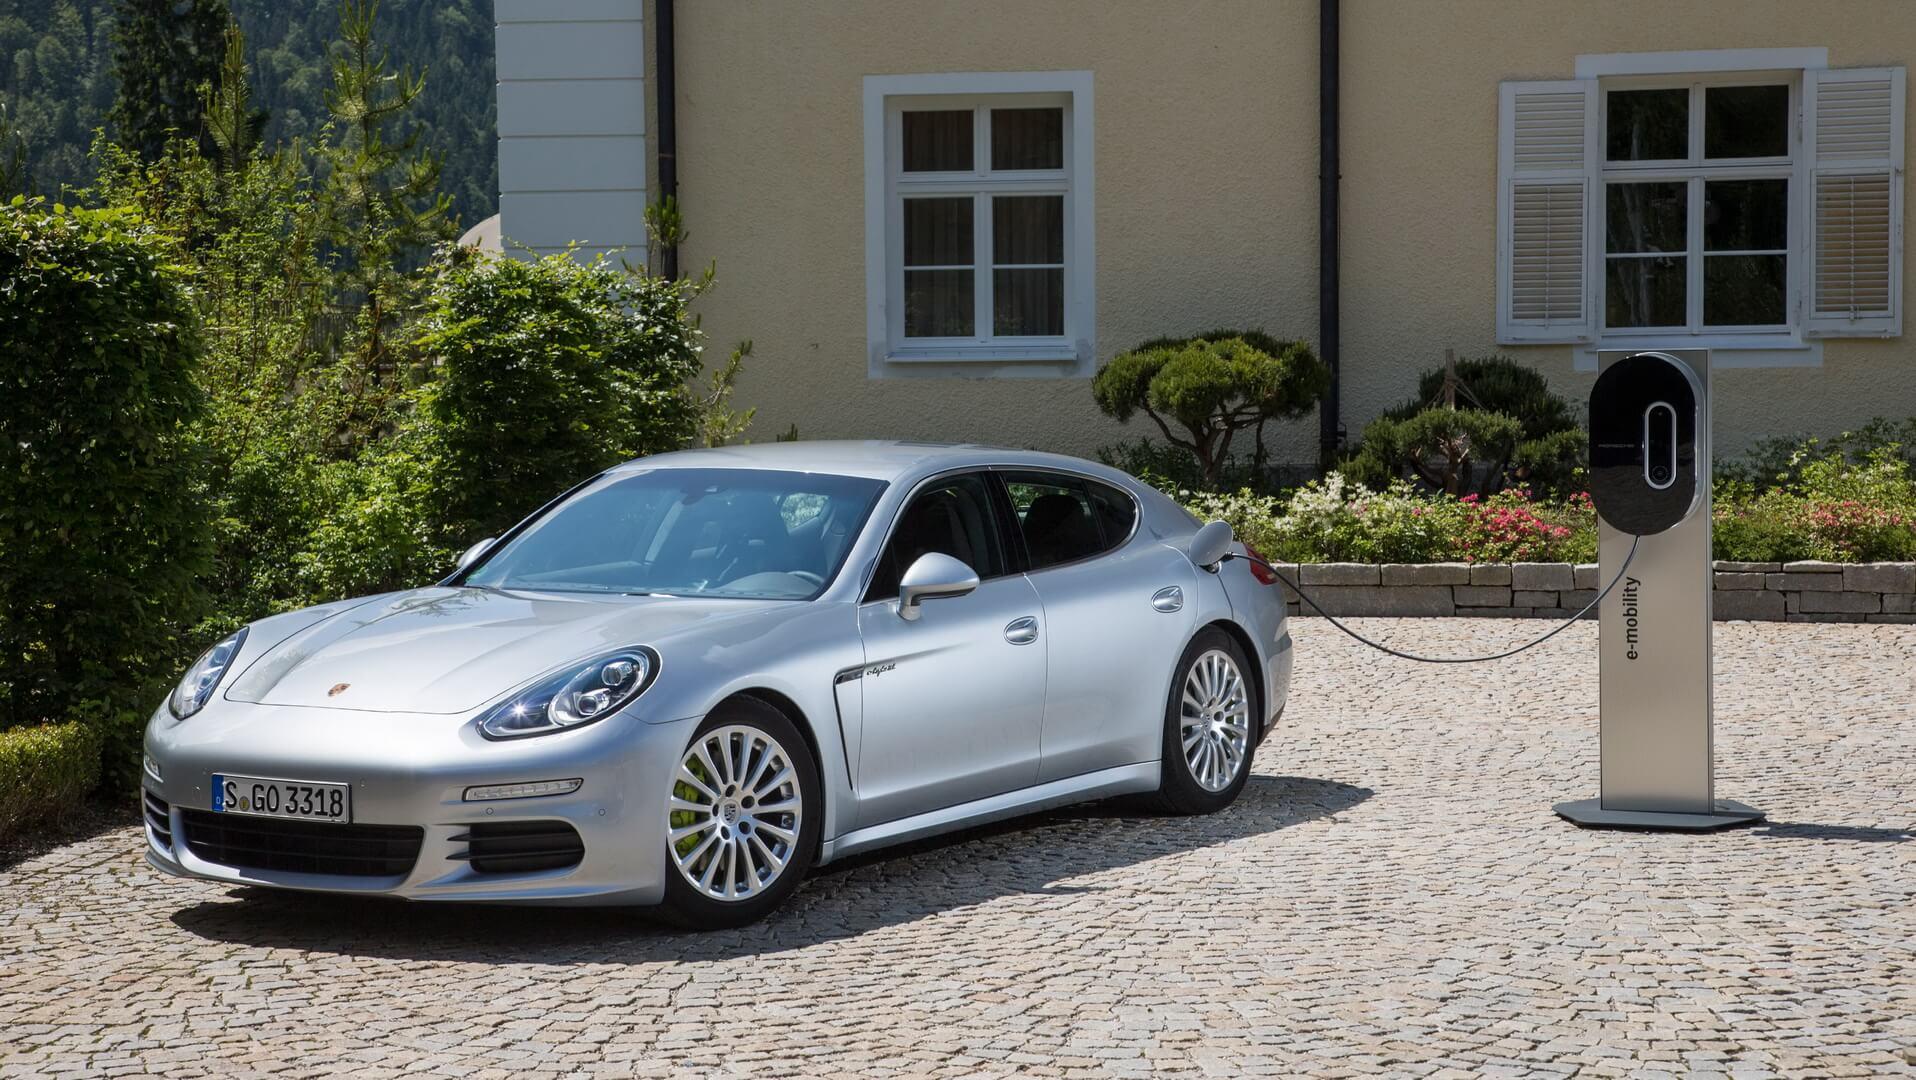 Плагин-гибрид Porsche Panamera S E-Hybrid на зарядке